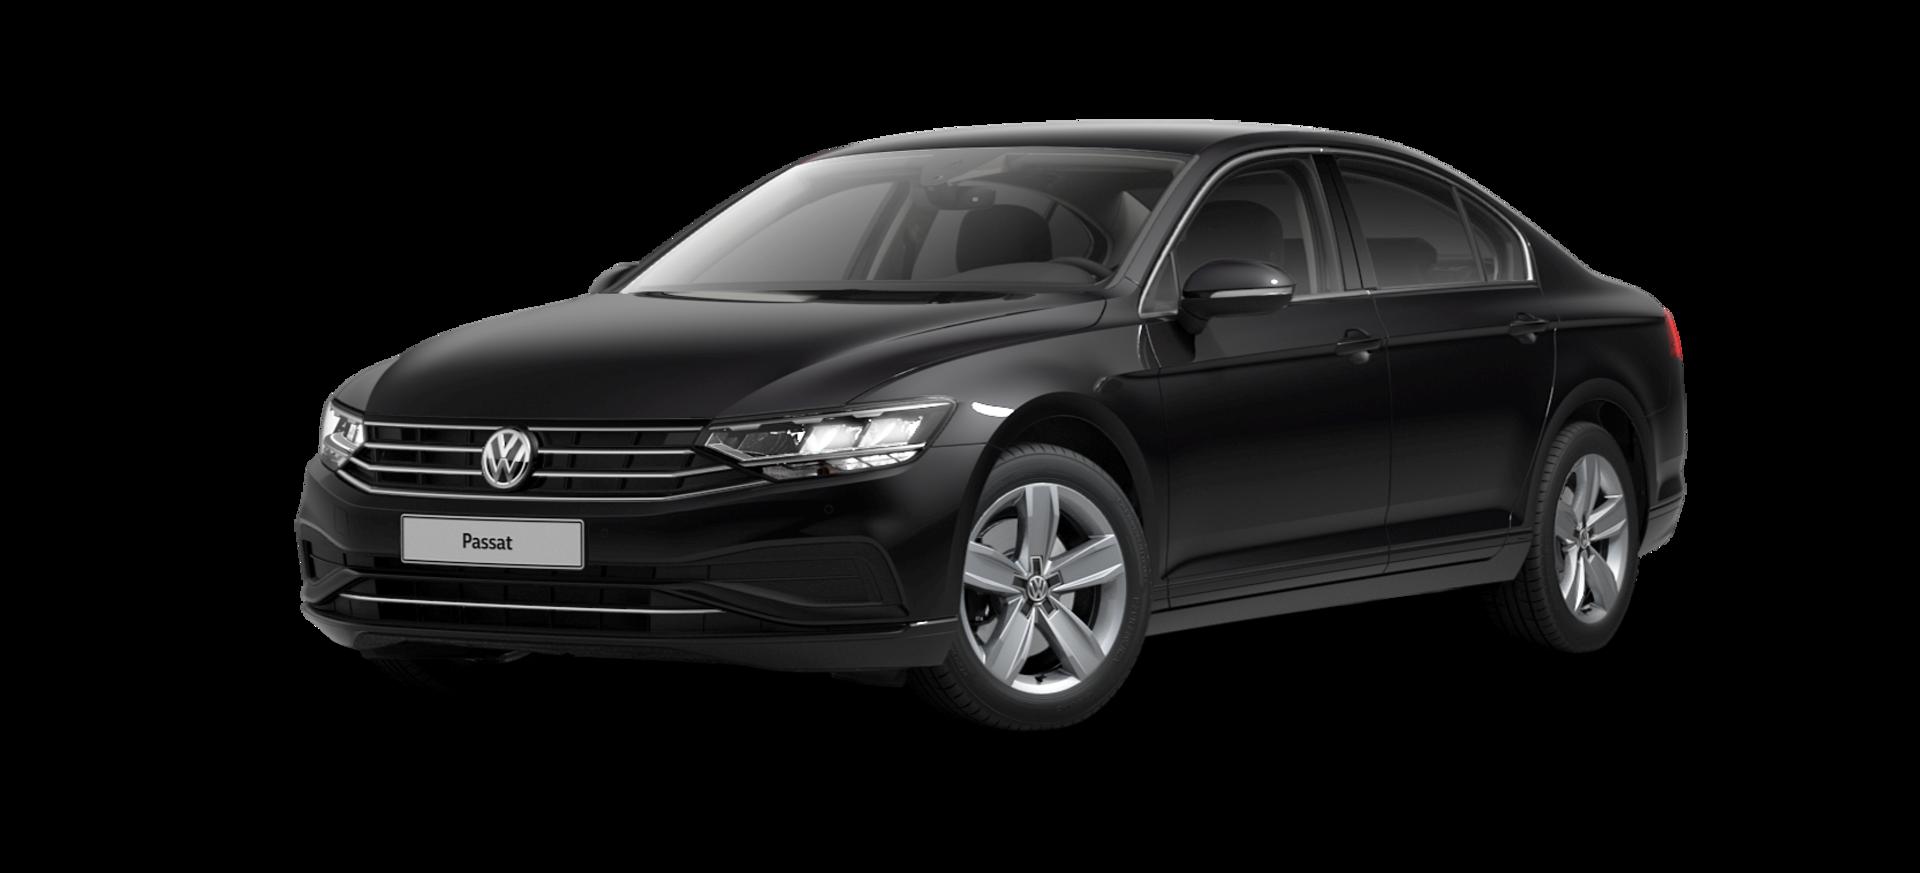 Noul Passat Comfortline 2.0 TDI DSG / 190 CP/140 kW / 2.0l / Direct Shift Gearbox / 4-usi : Volkswagen Passat